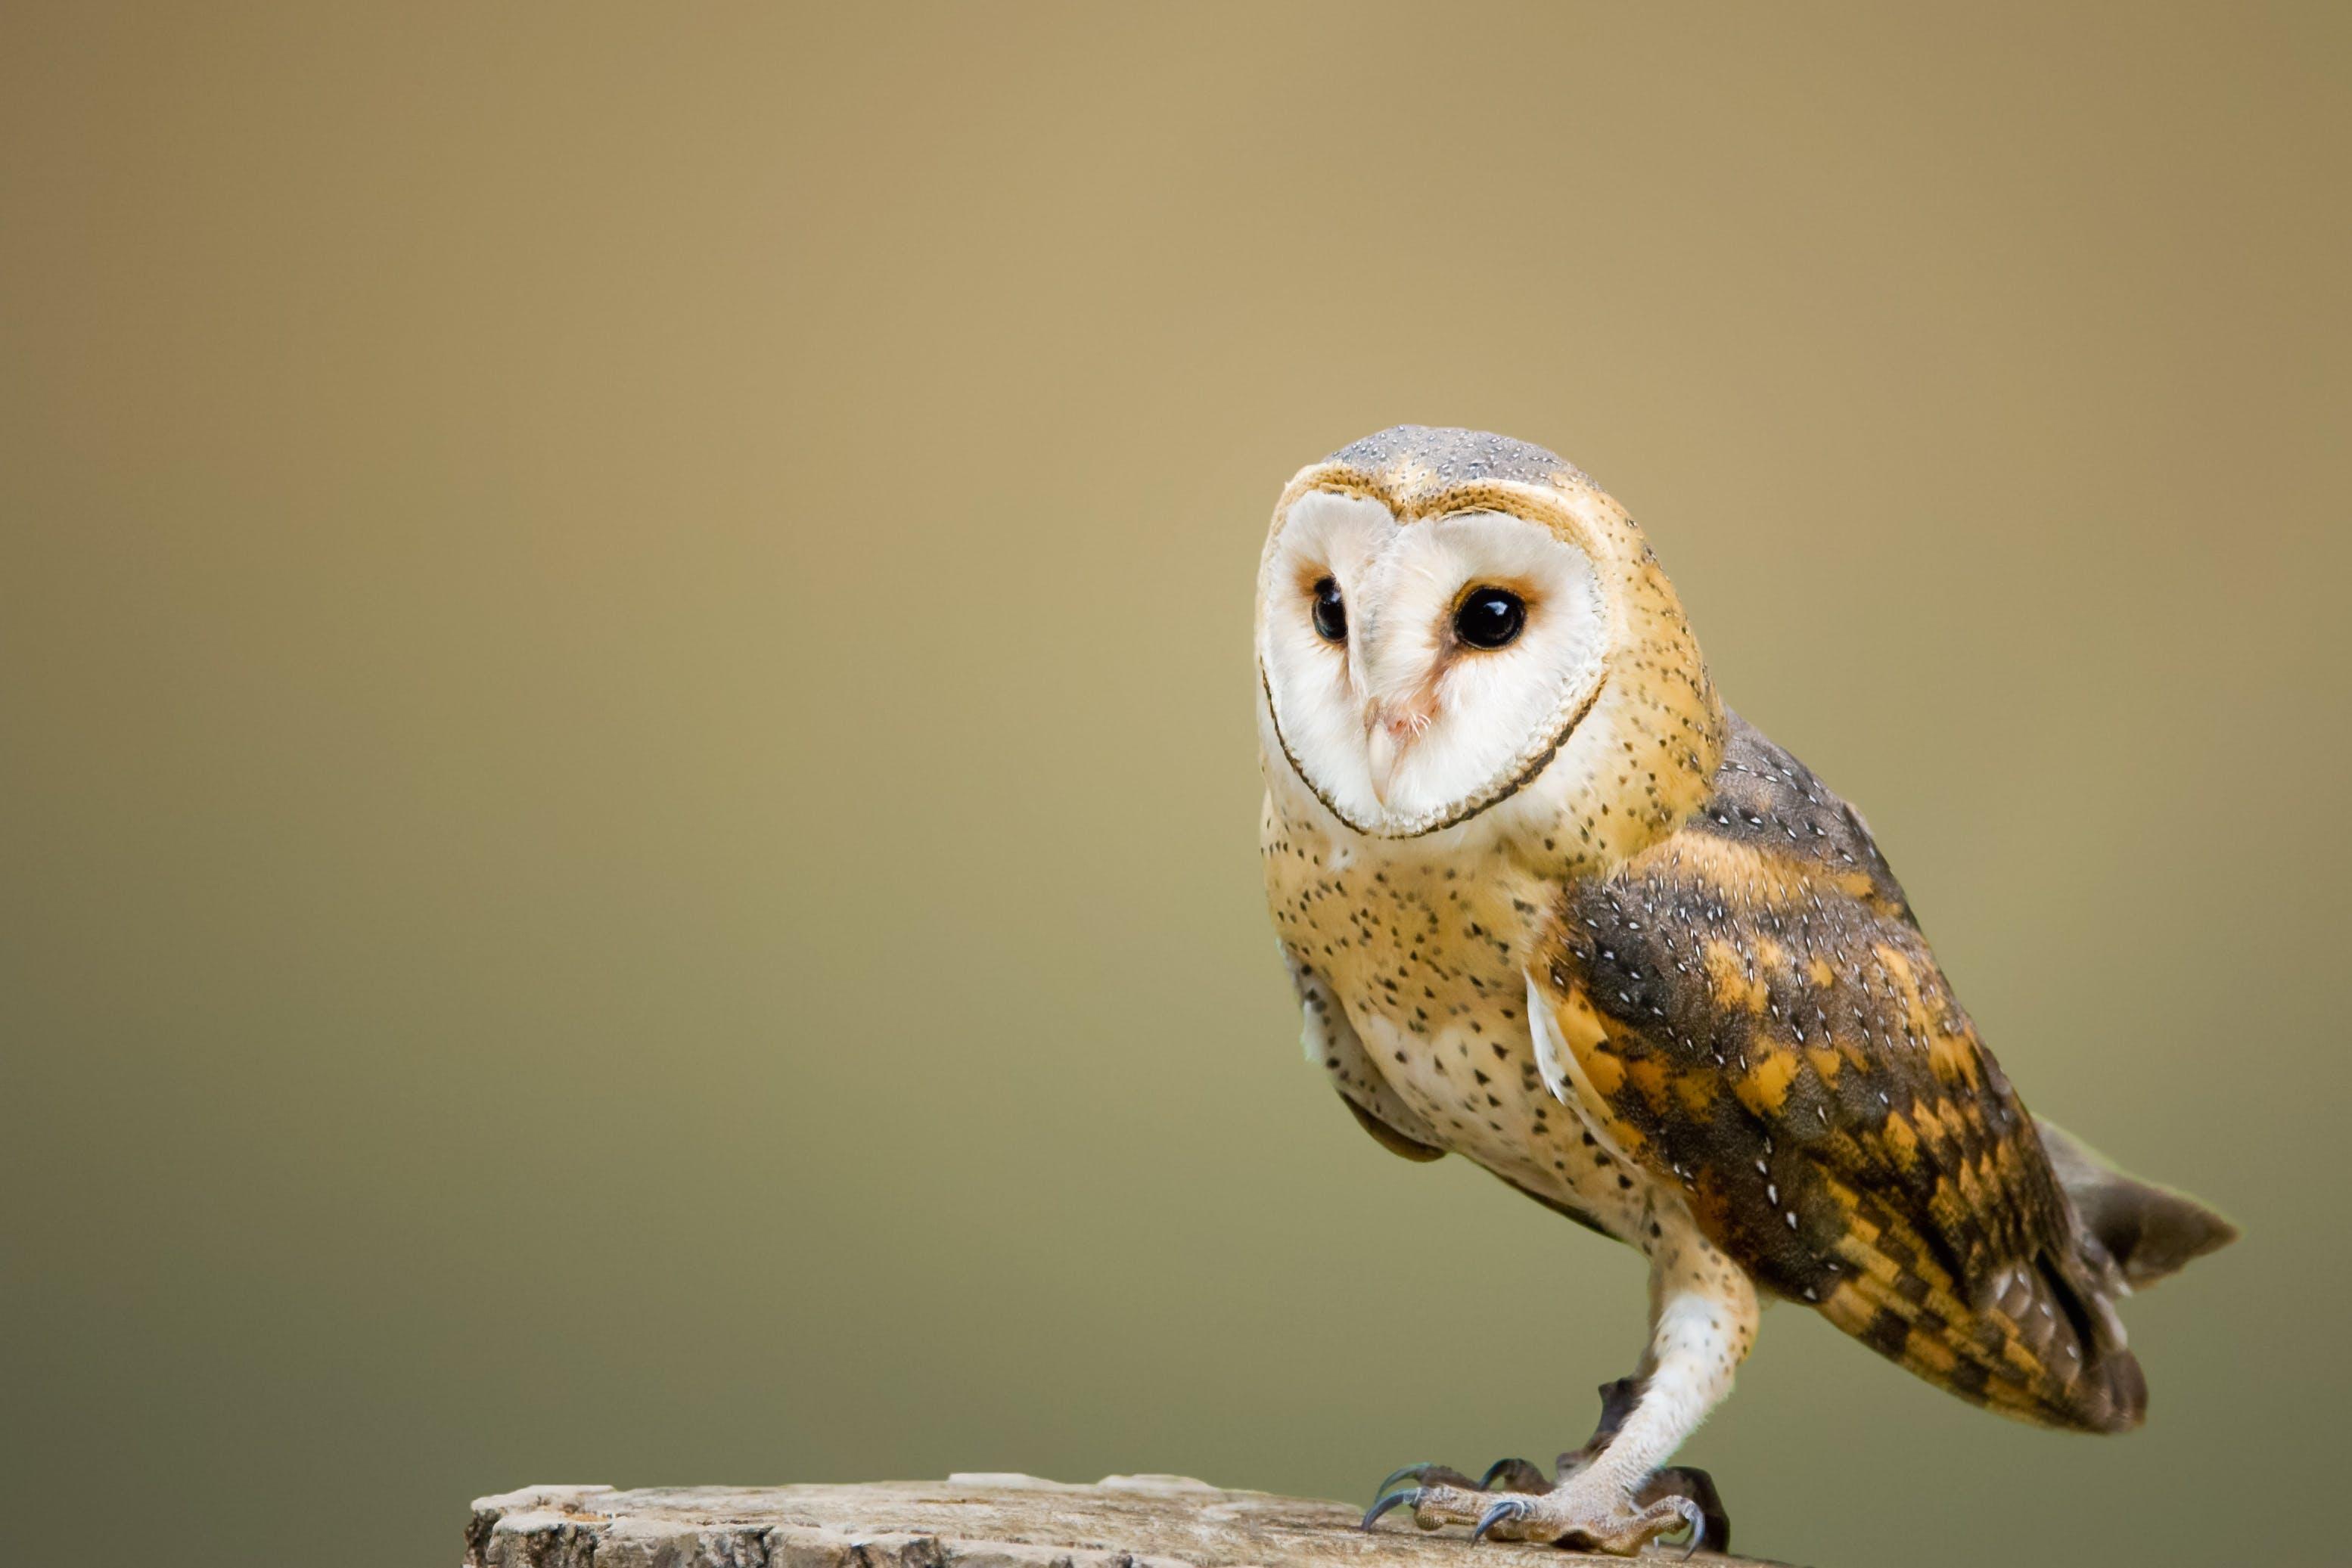 Beige and Brown Owl on Top of Tree Log